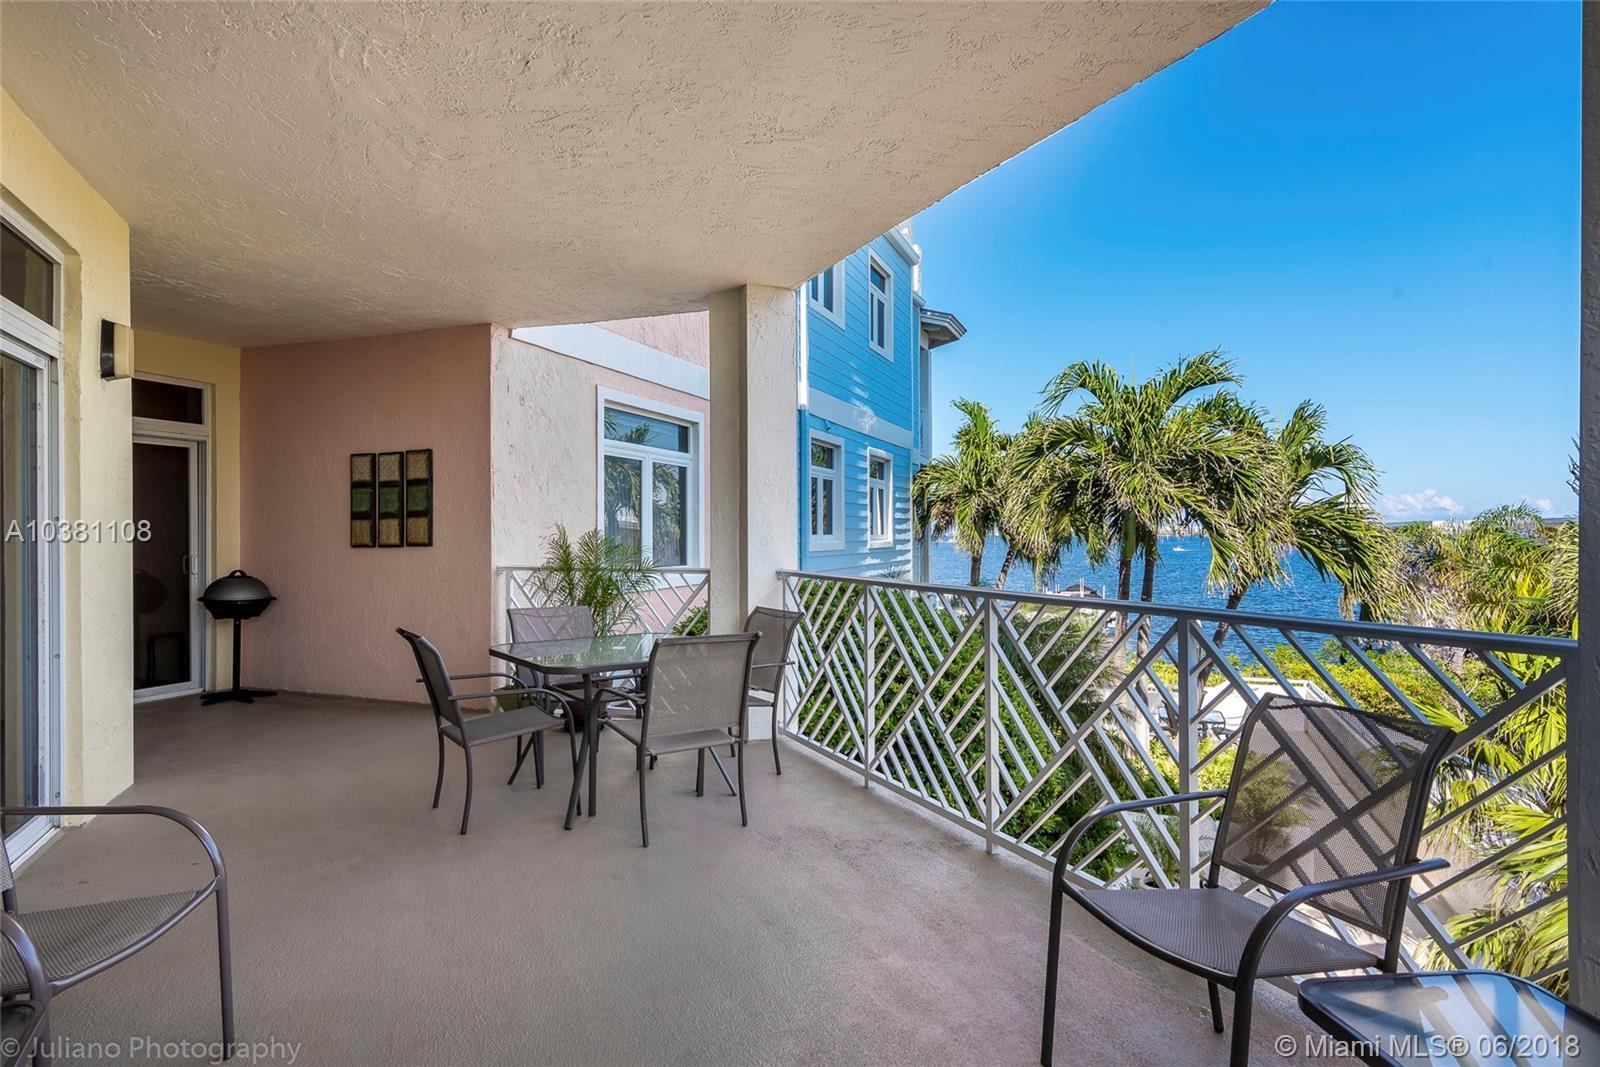 309 E Ocean Ave #202, Lantana FL, 33462